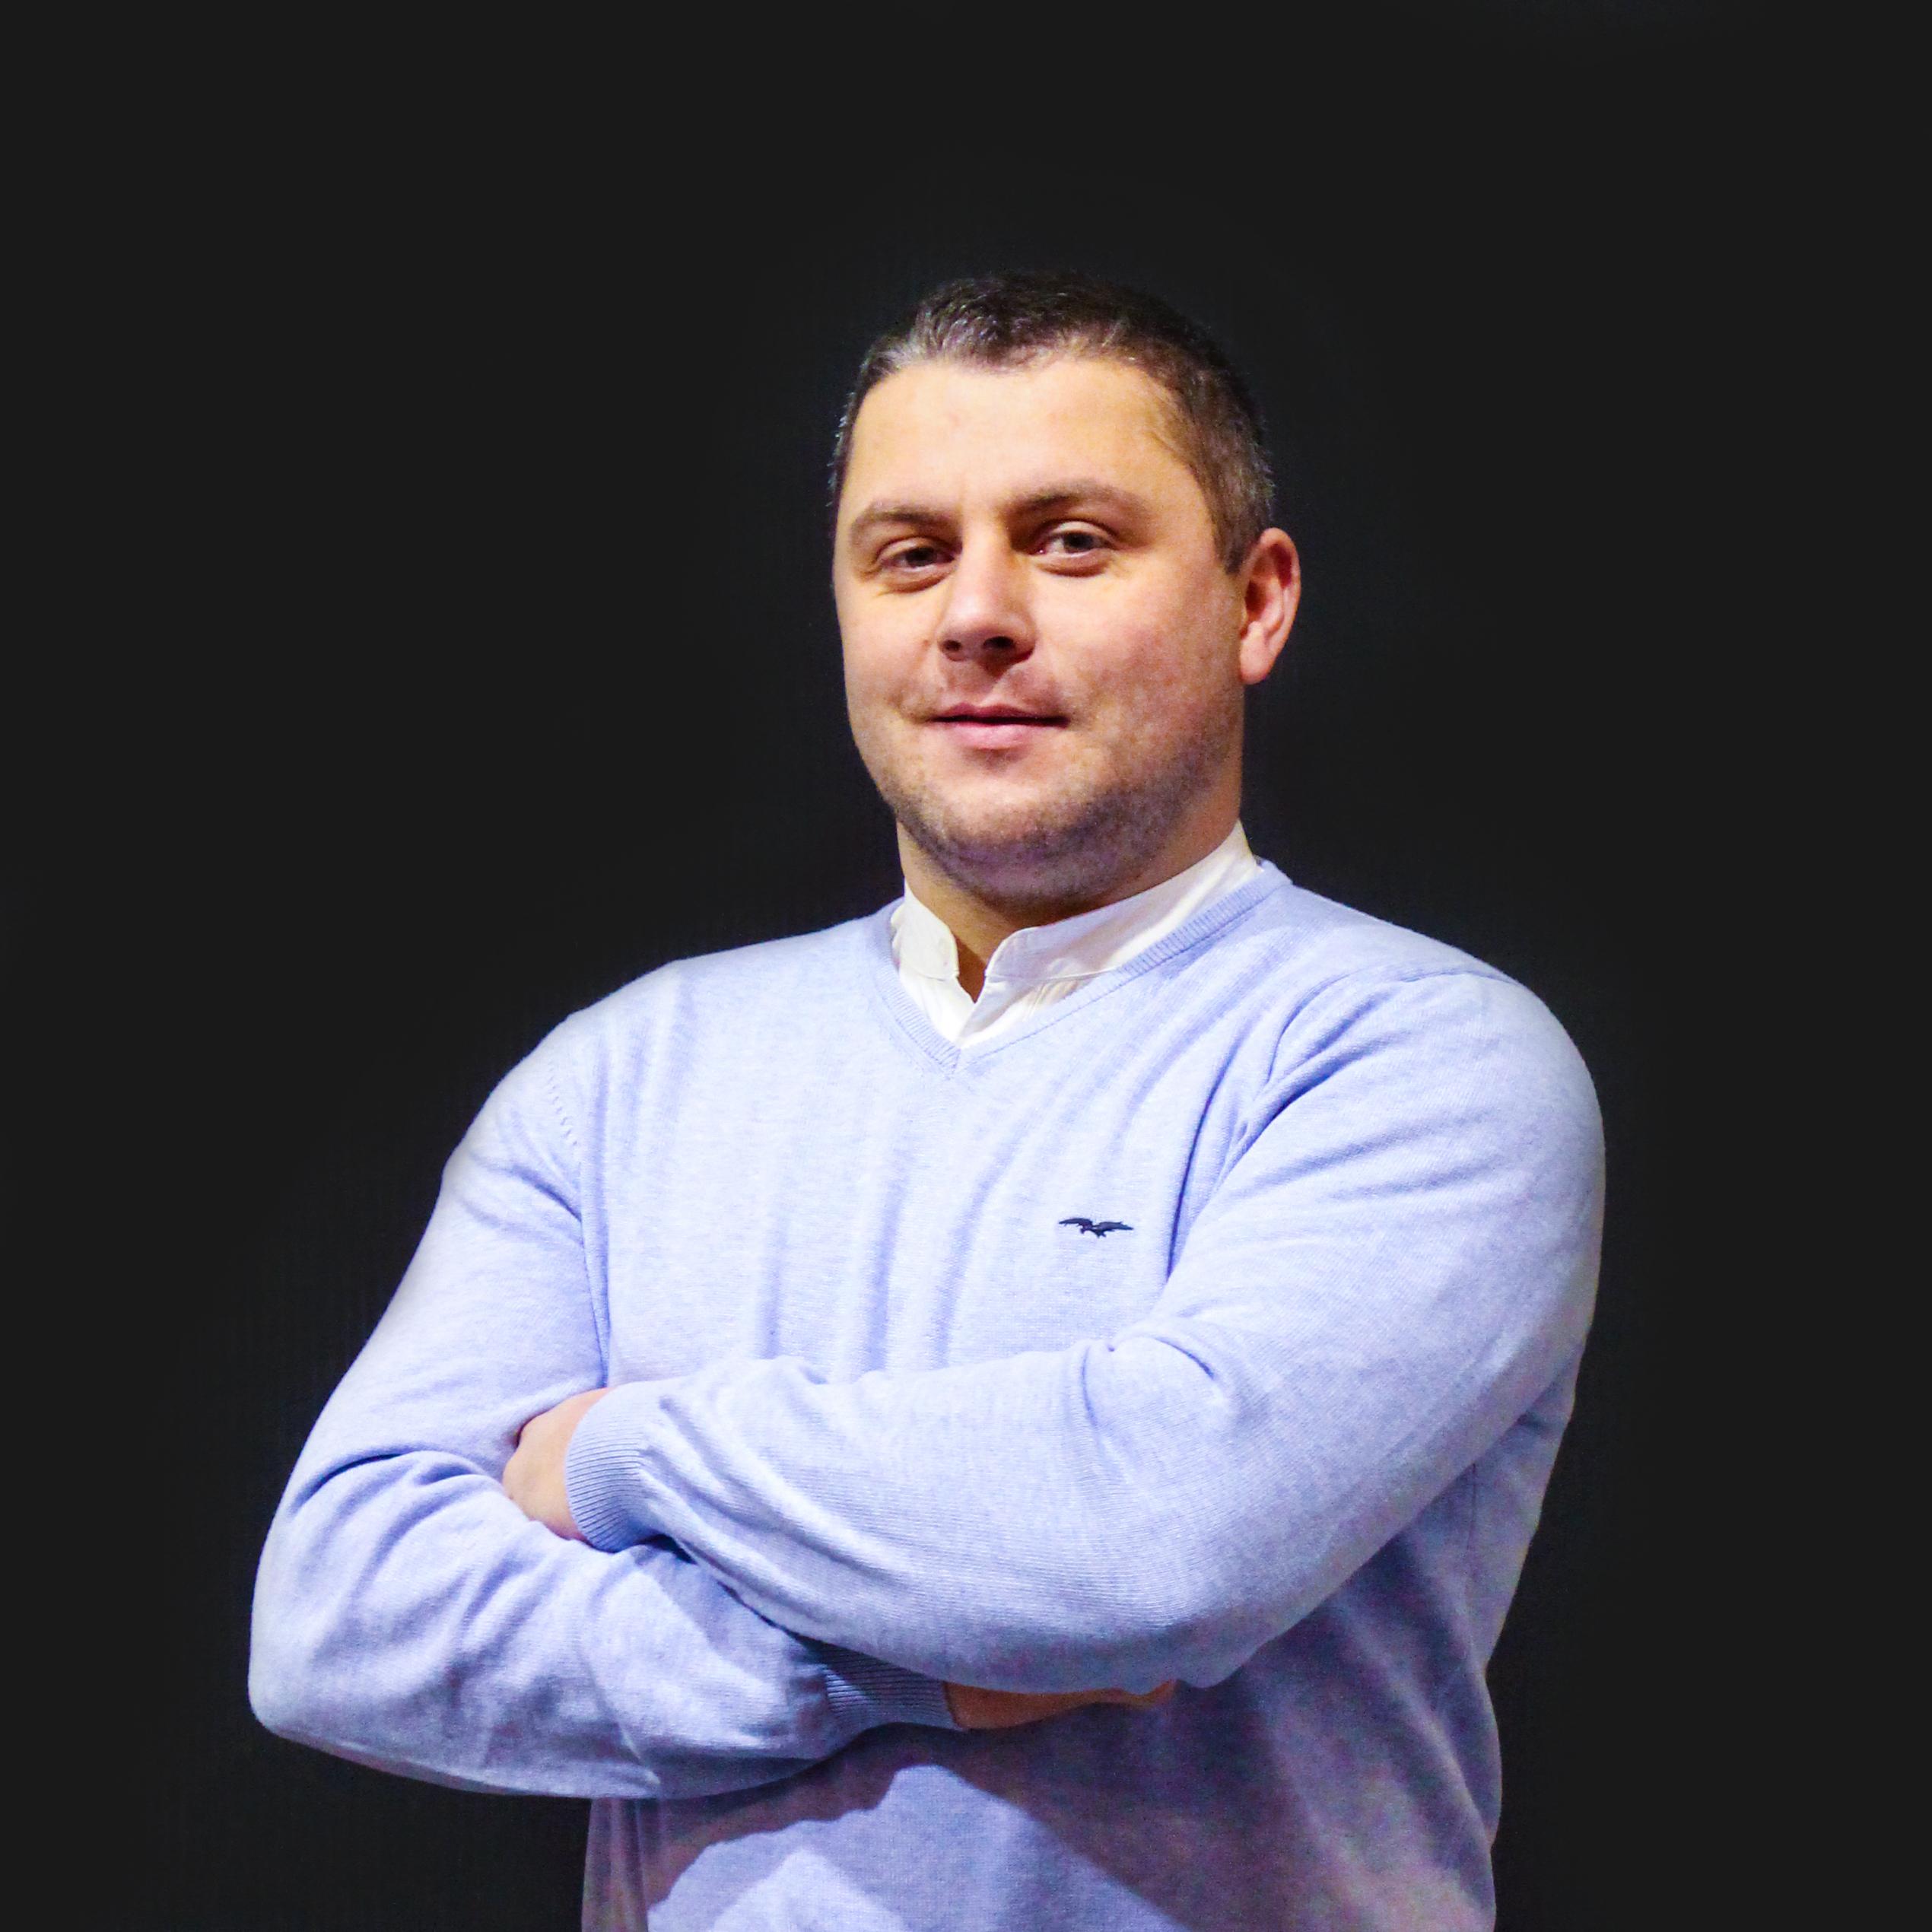 Michal kolakowski - Verksmester hos Ådalen Truck AS